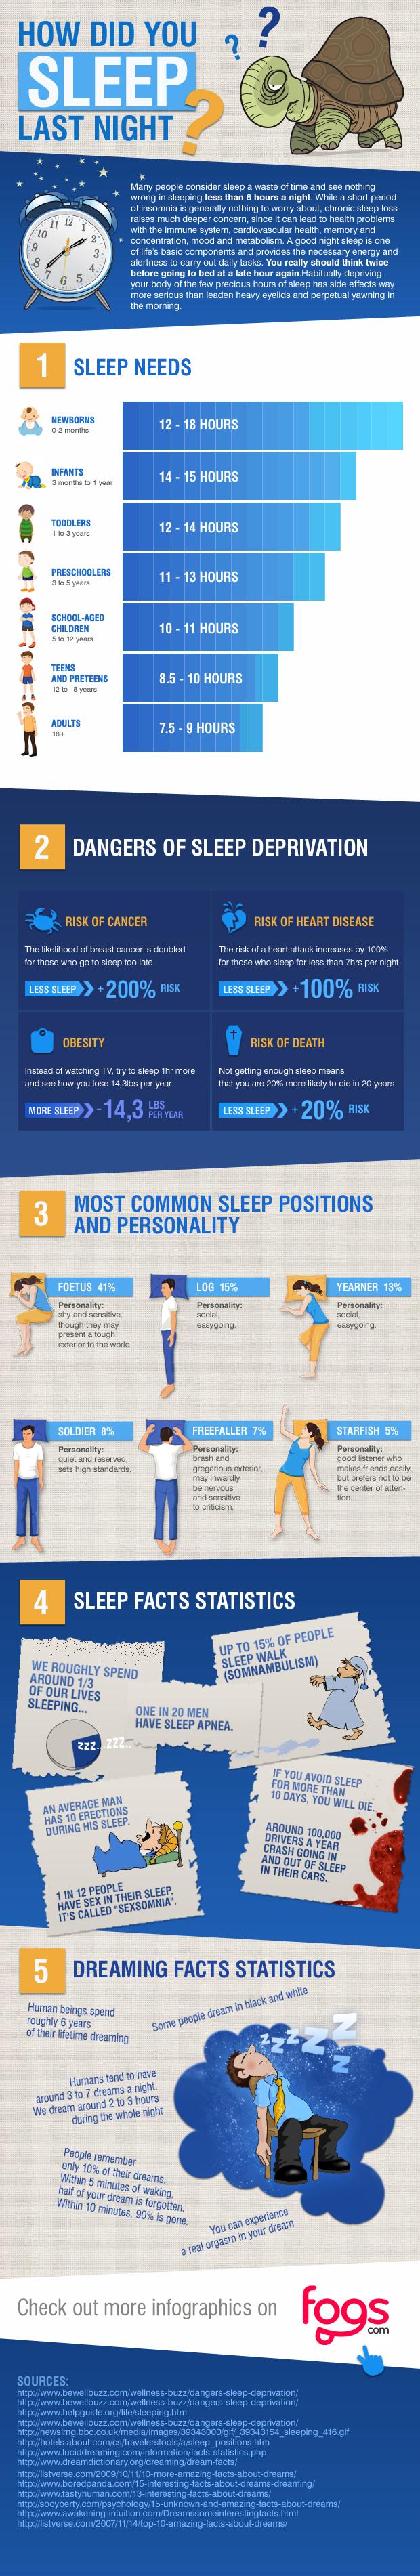 how-did-you-sleep-last-night_50607c9d2bbc1